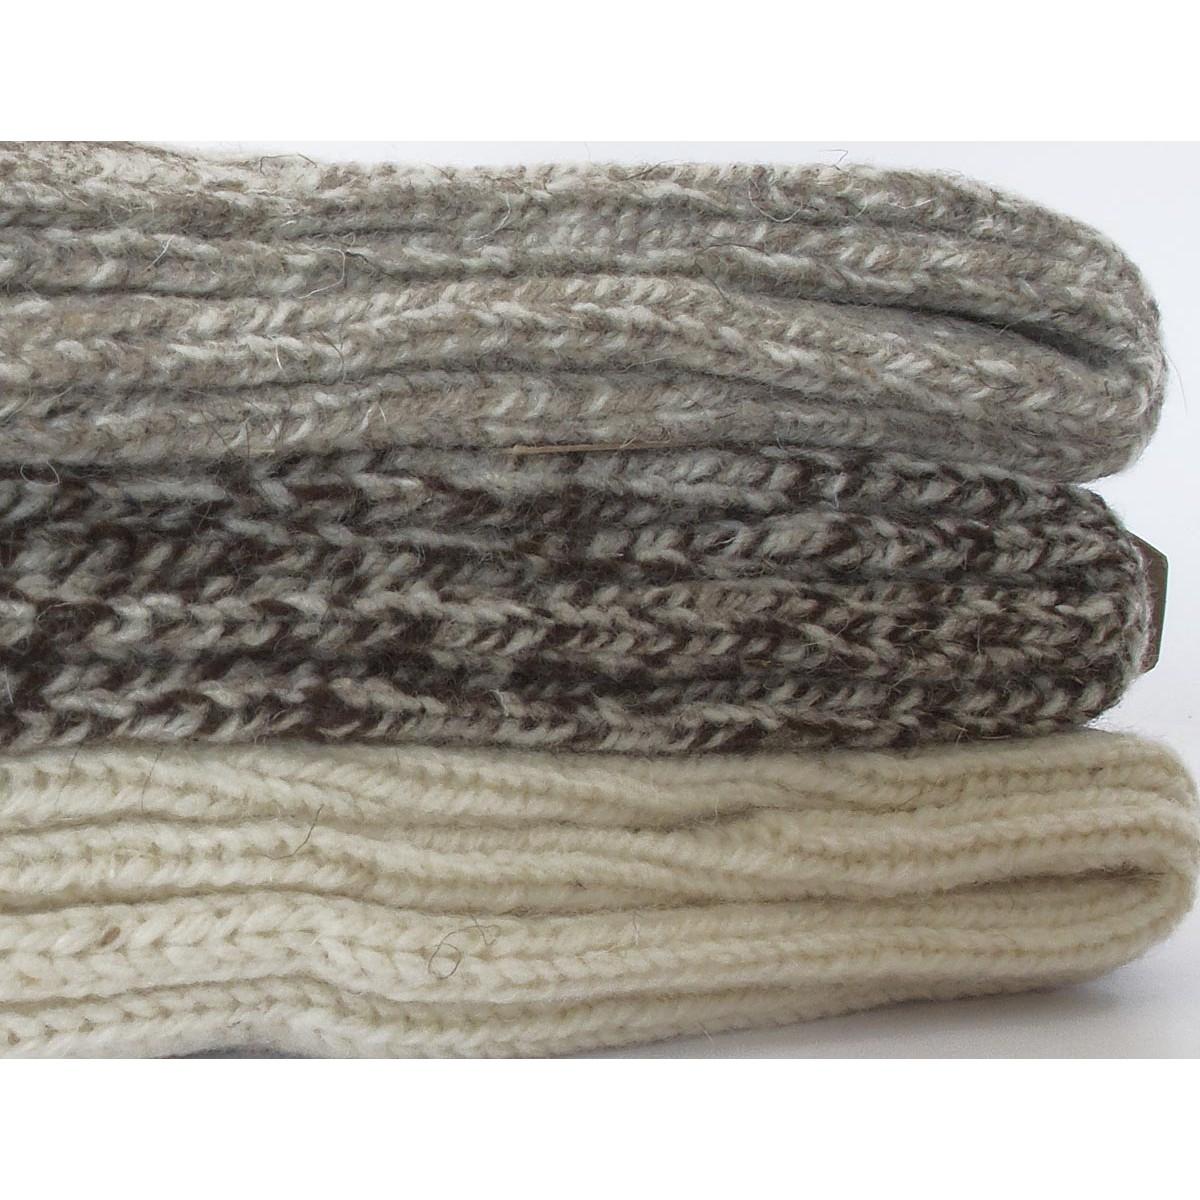 chaussettes 100 en laine tradition chaussettes hiver inuka. Black Bedroom Furniture Sets. Home Design Ideas